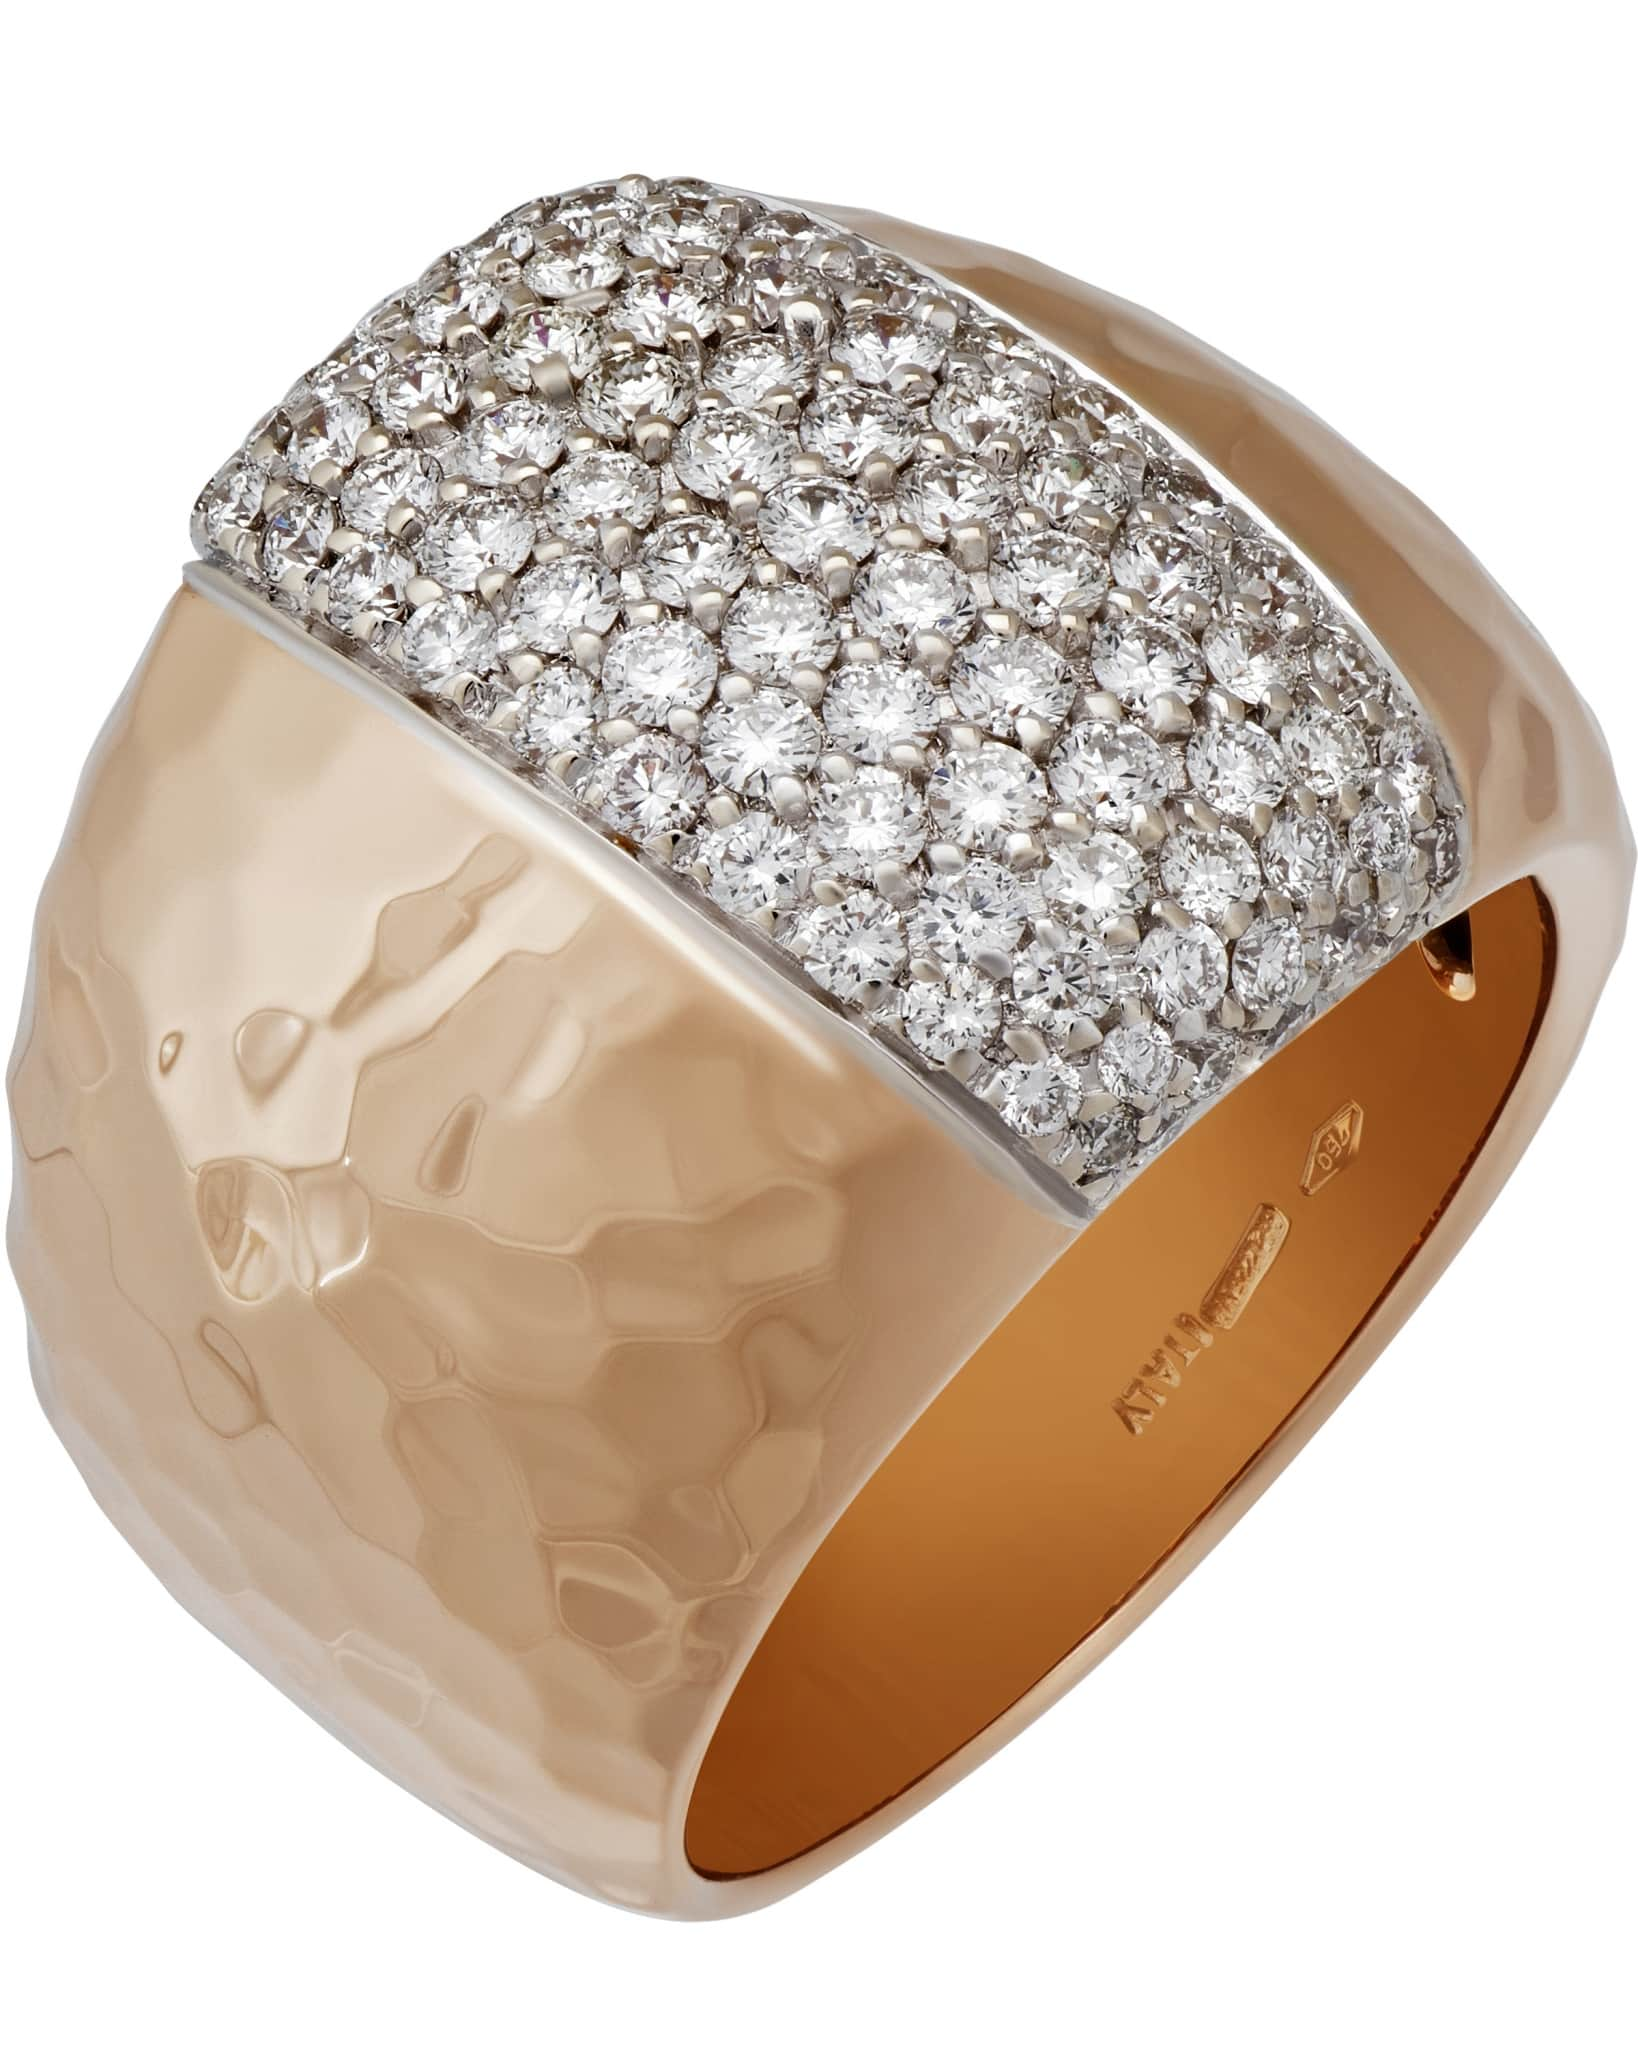 Roberto Coin – 18K Rose Gold, Diamond & Ruby Ring Sz 7 ADR473RI0173